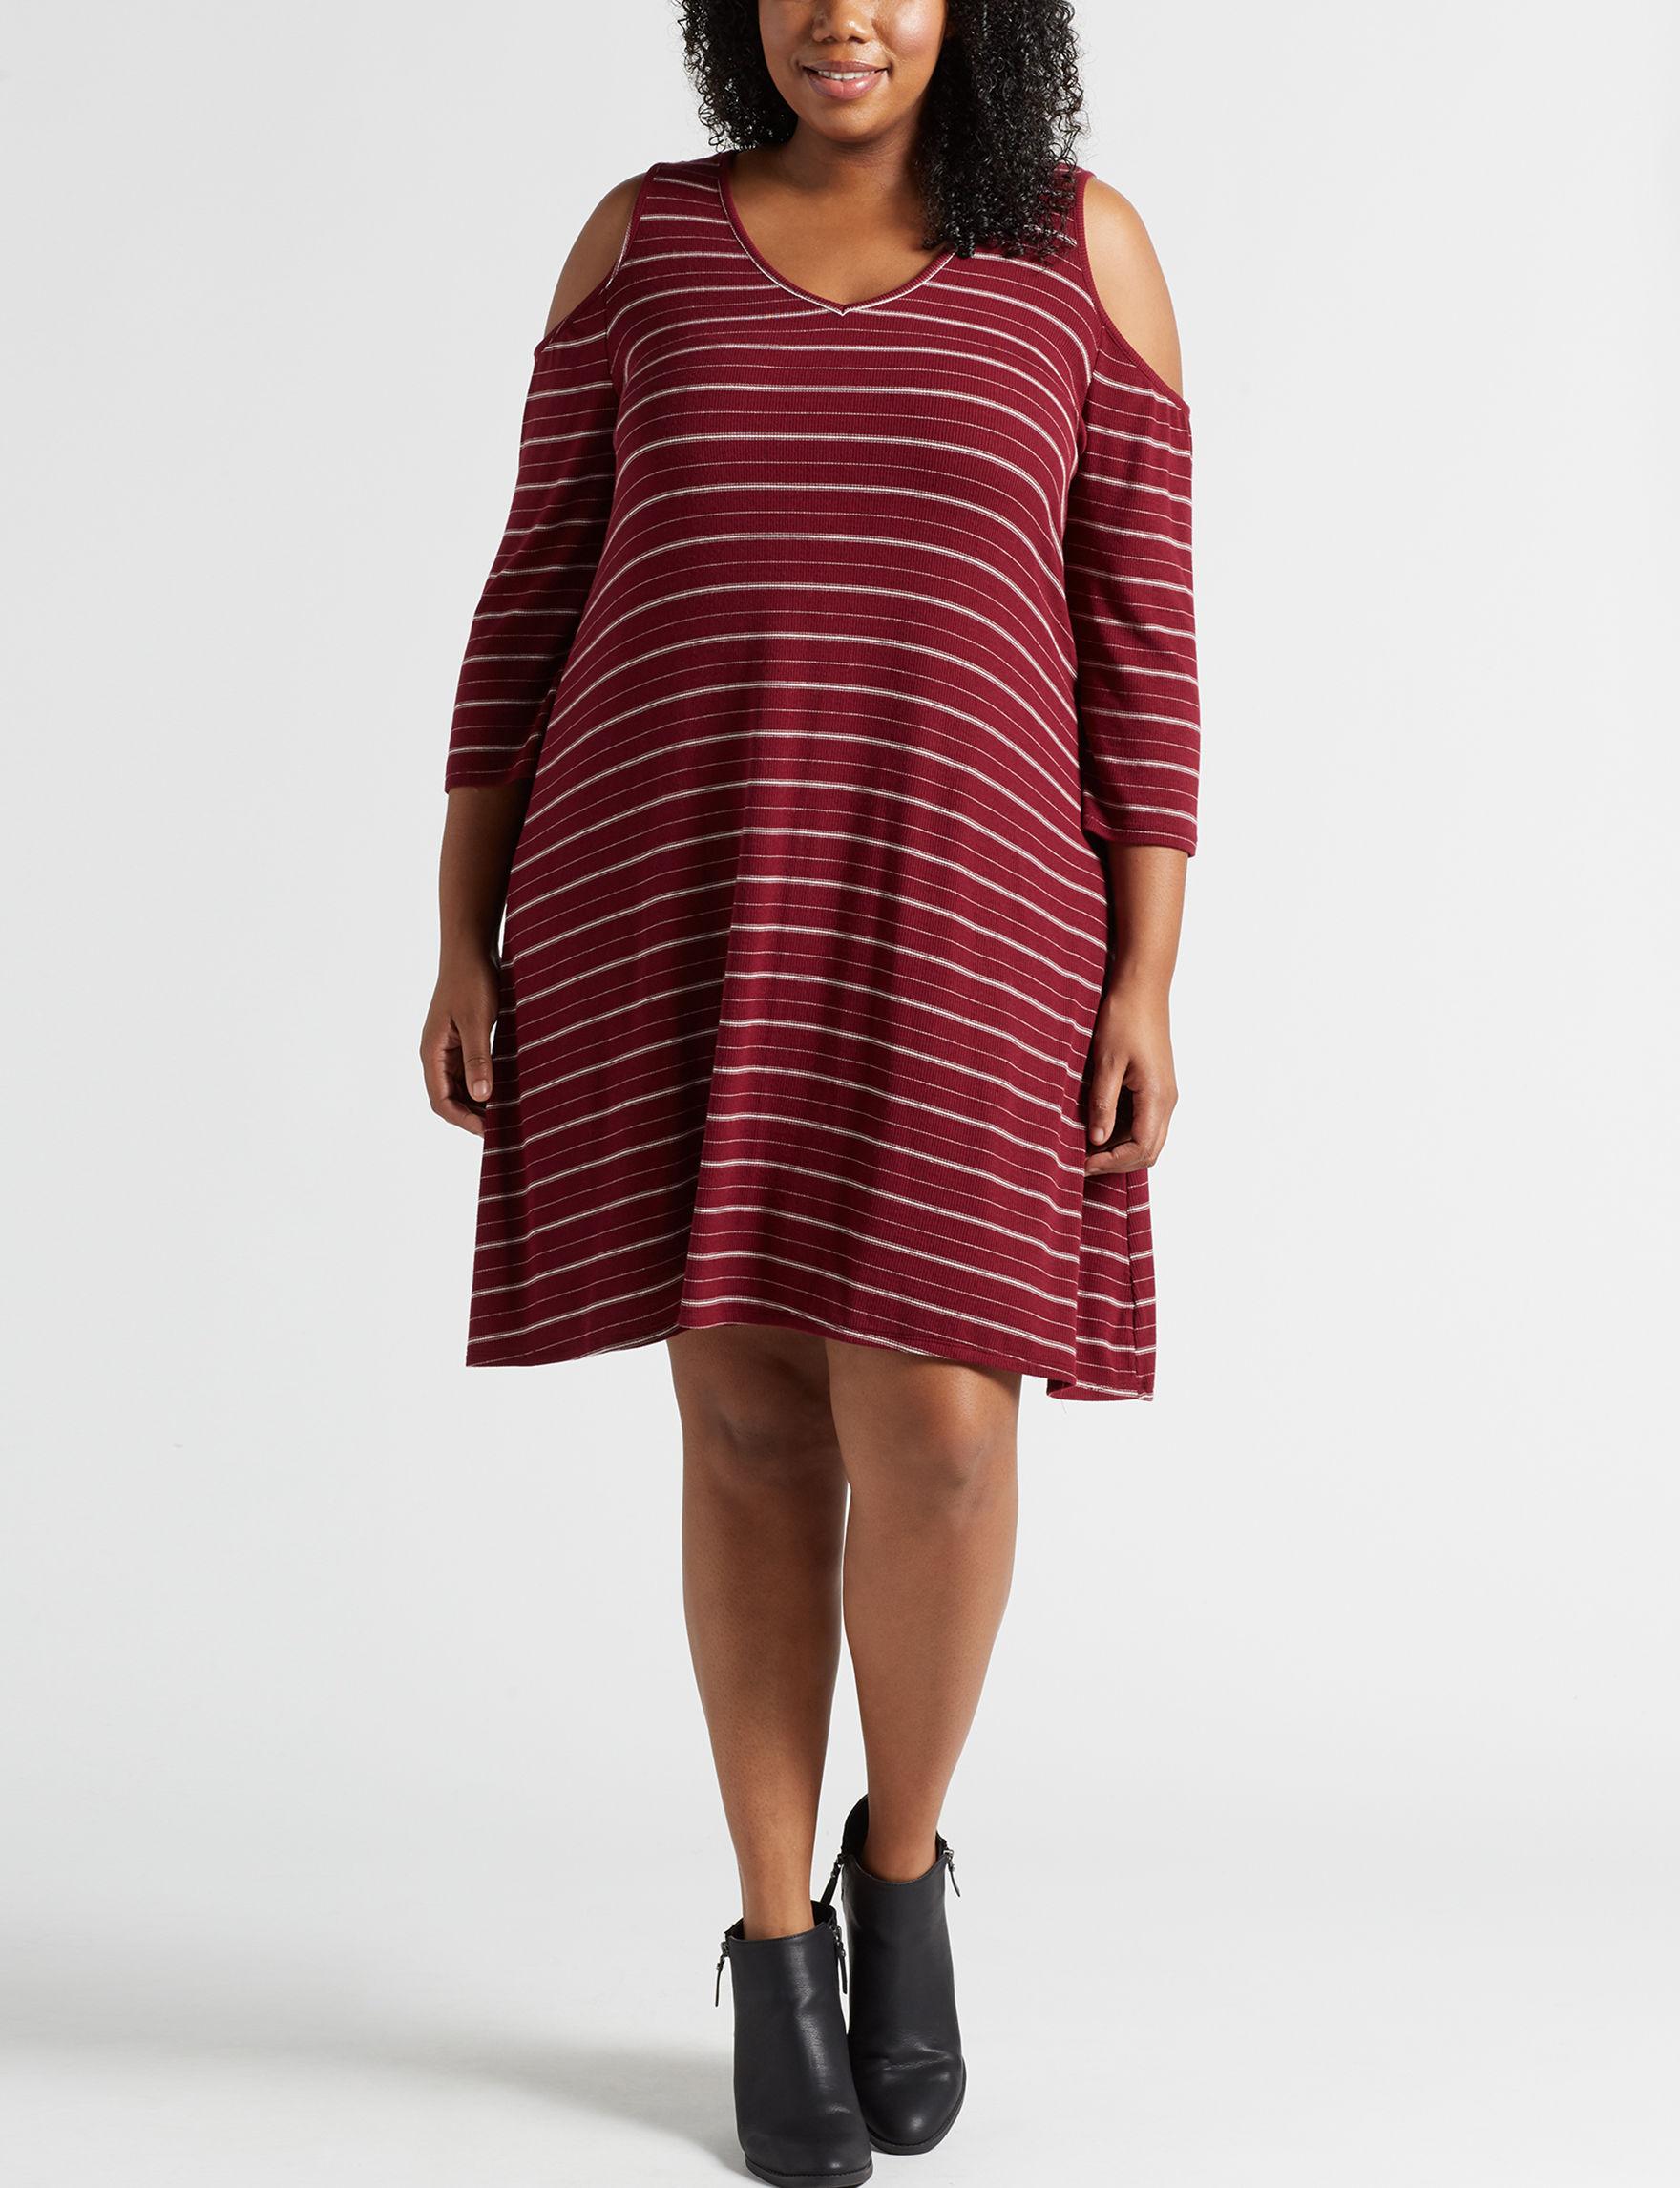 Wishful Park Wine Stripe Everyday & Casual Shift Dresses